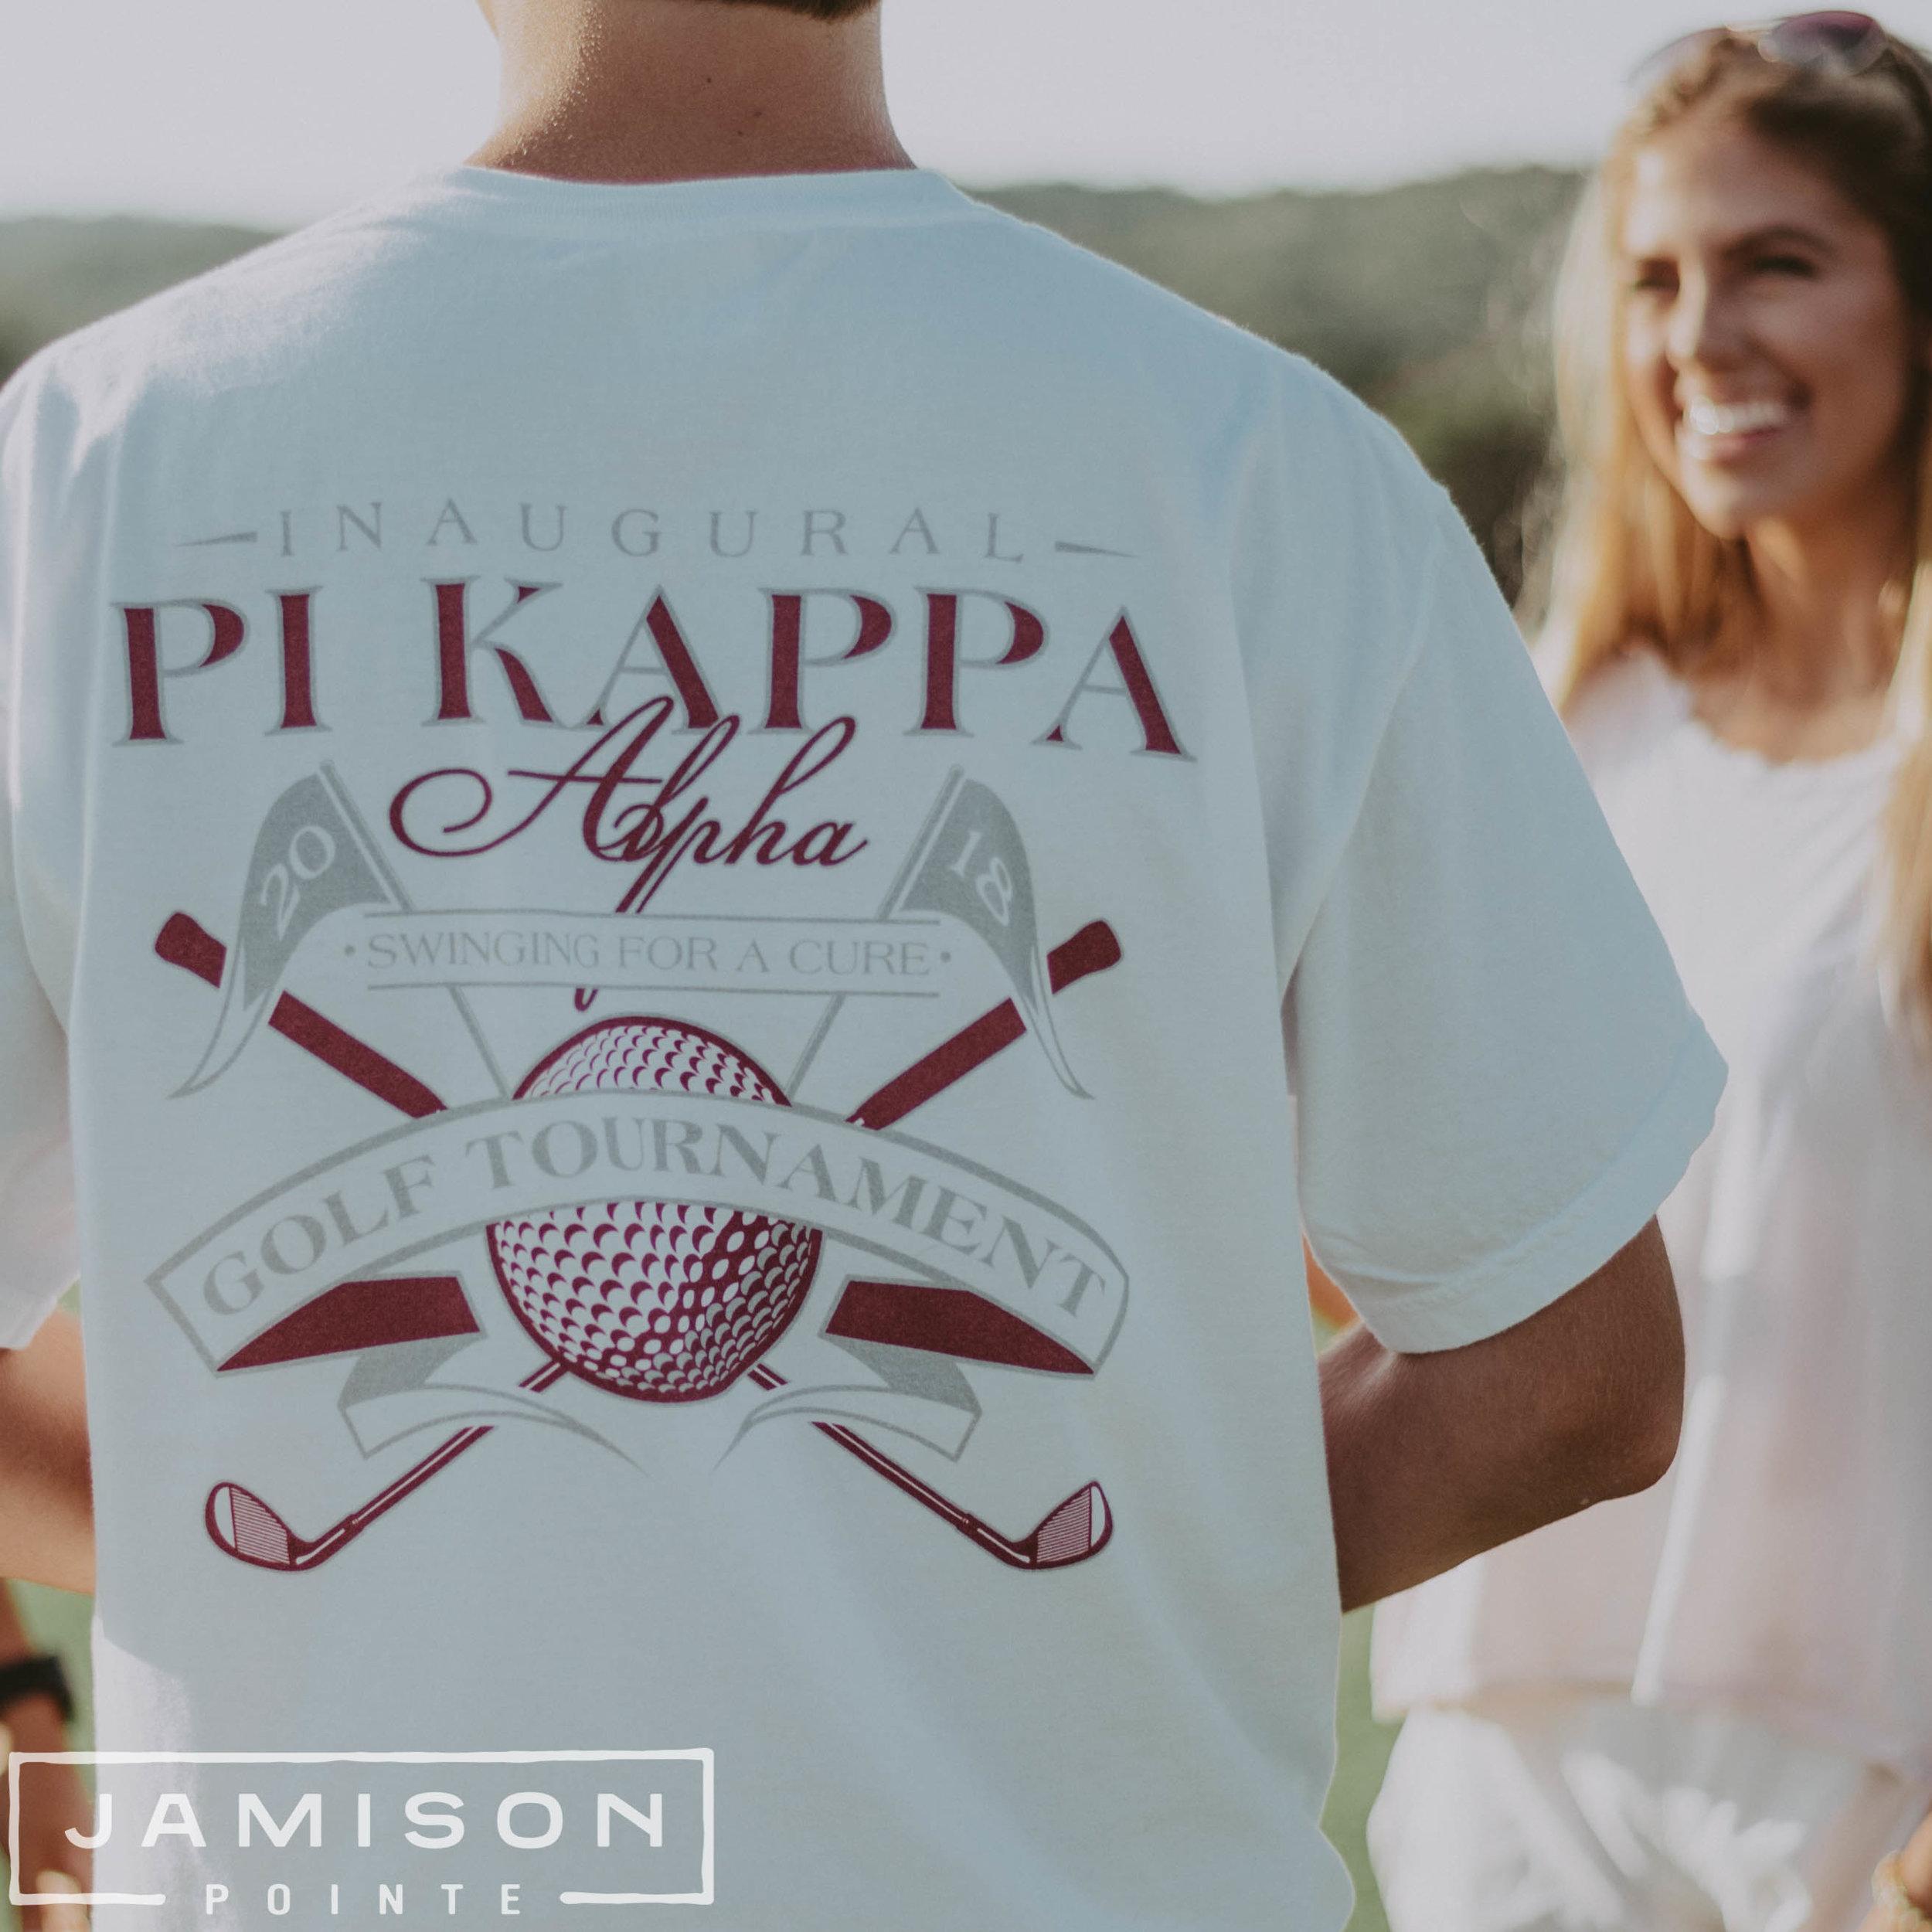 Pi Kappa Alpha Golf Tournament Tshirt